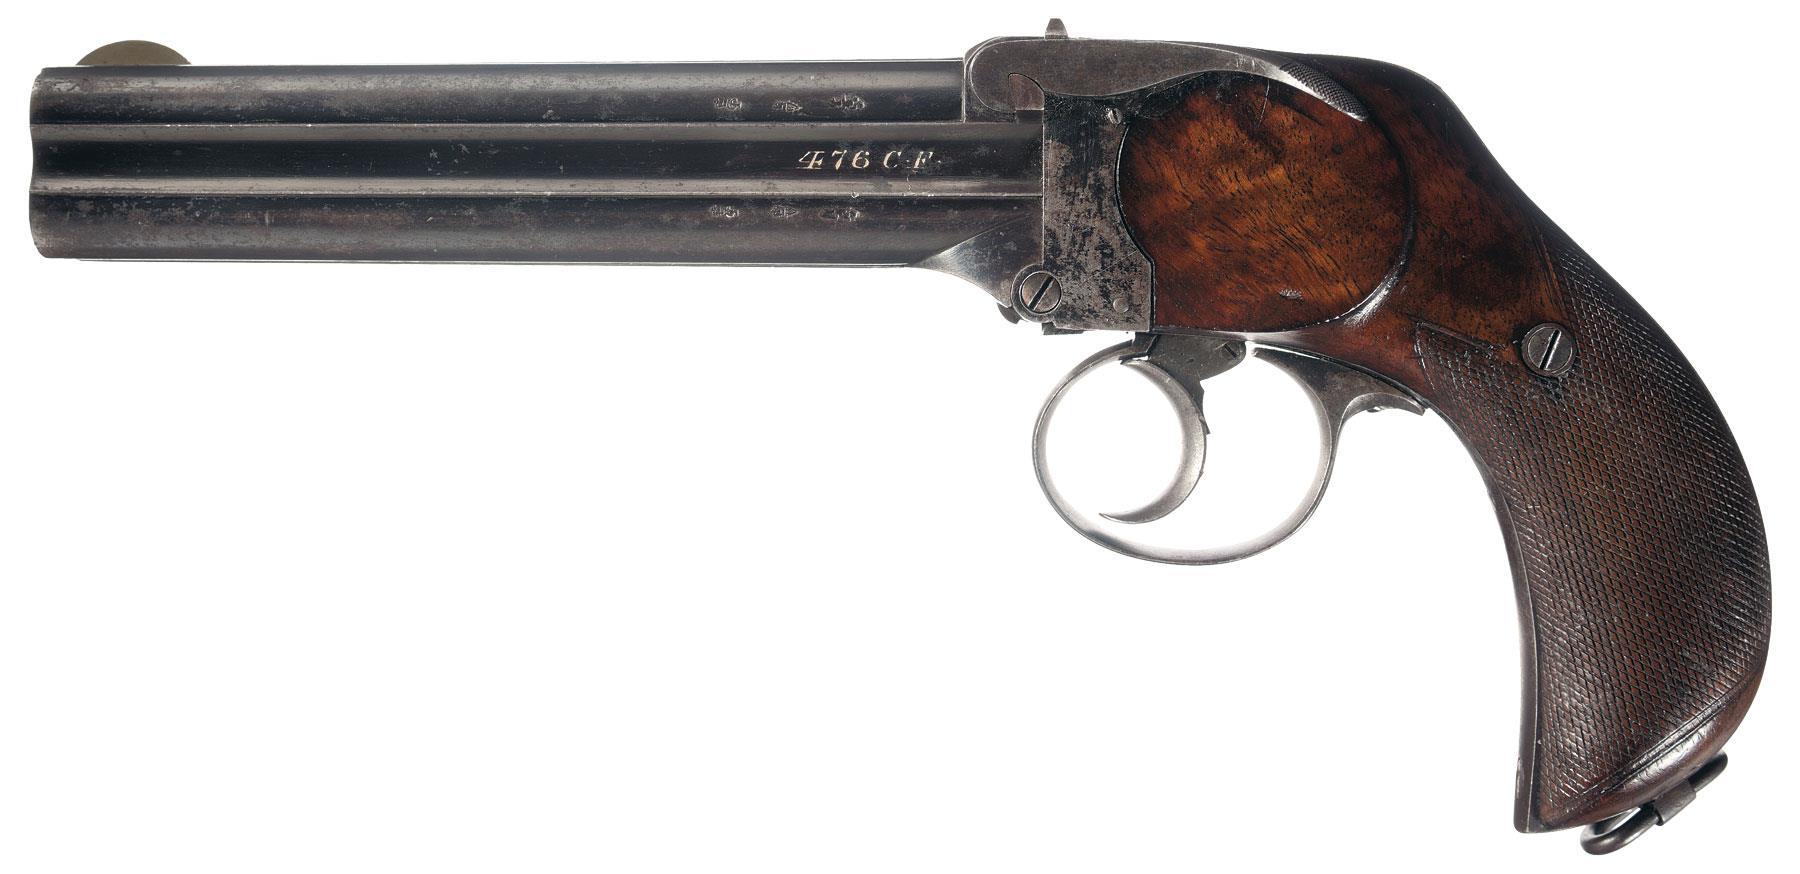 Lancaster pistol